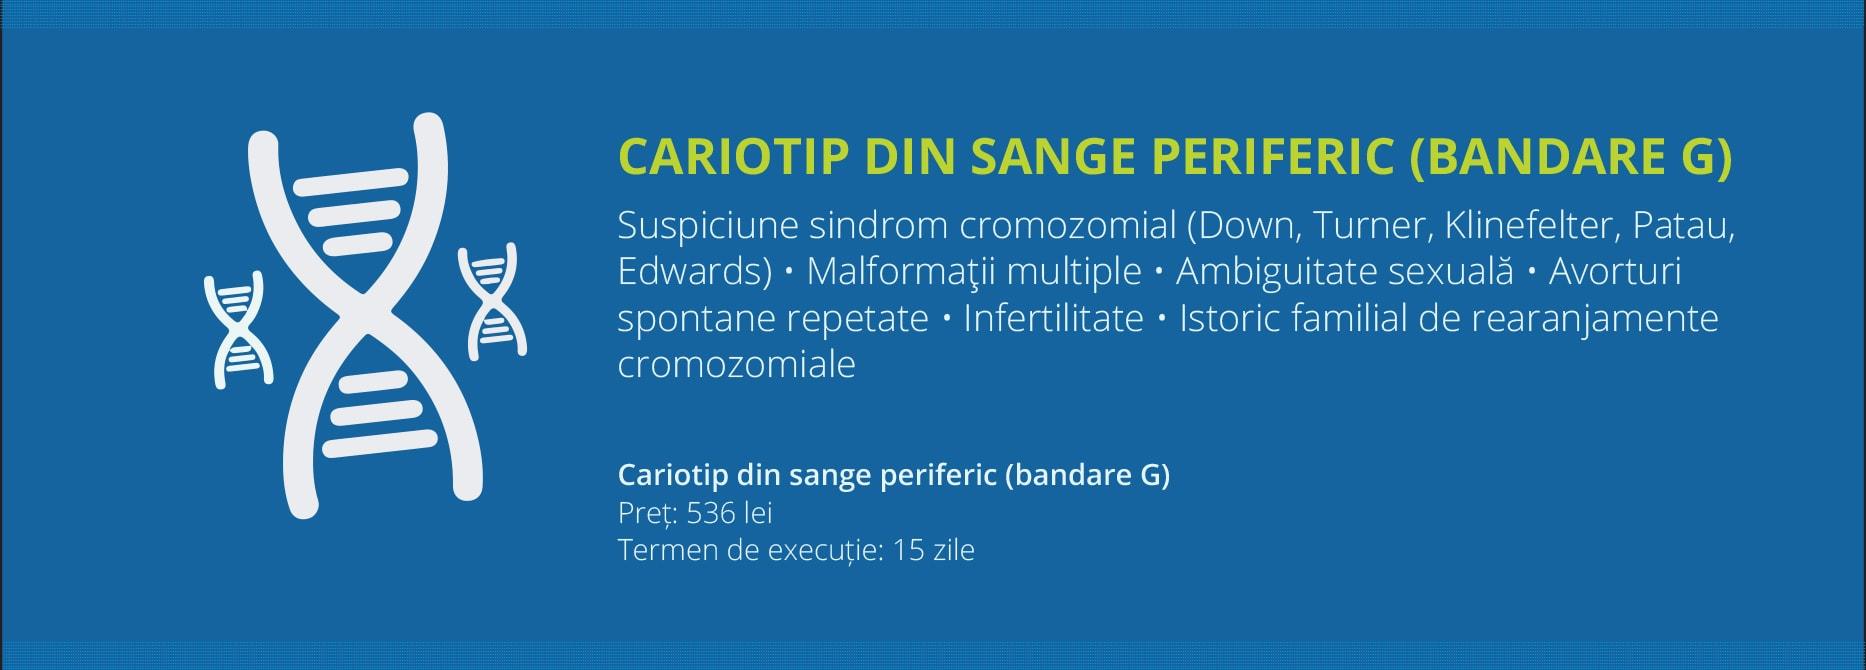 analiza-cariotic-din-sange-periferic-bandare-g-min